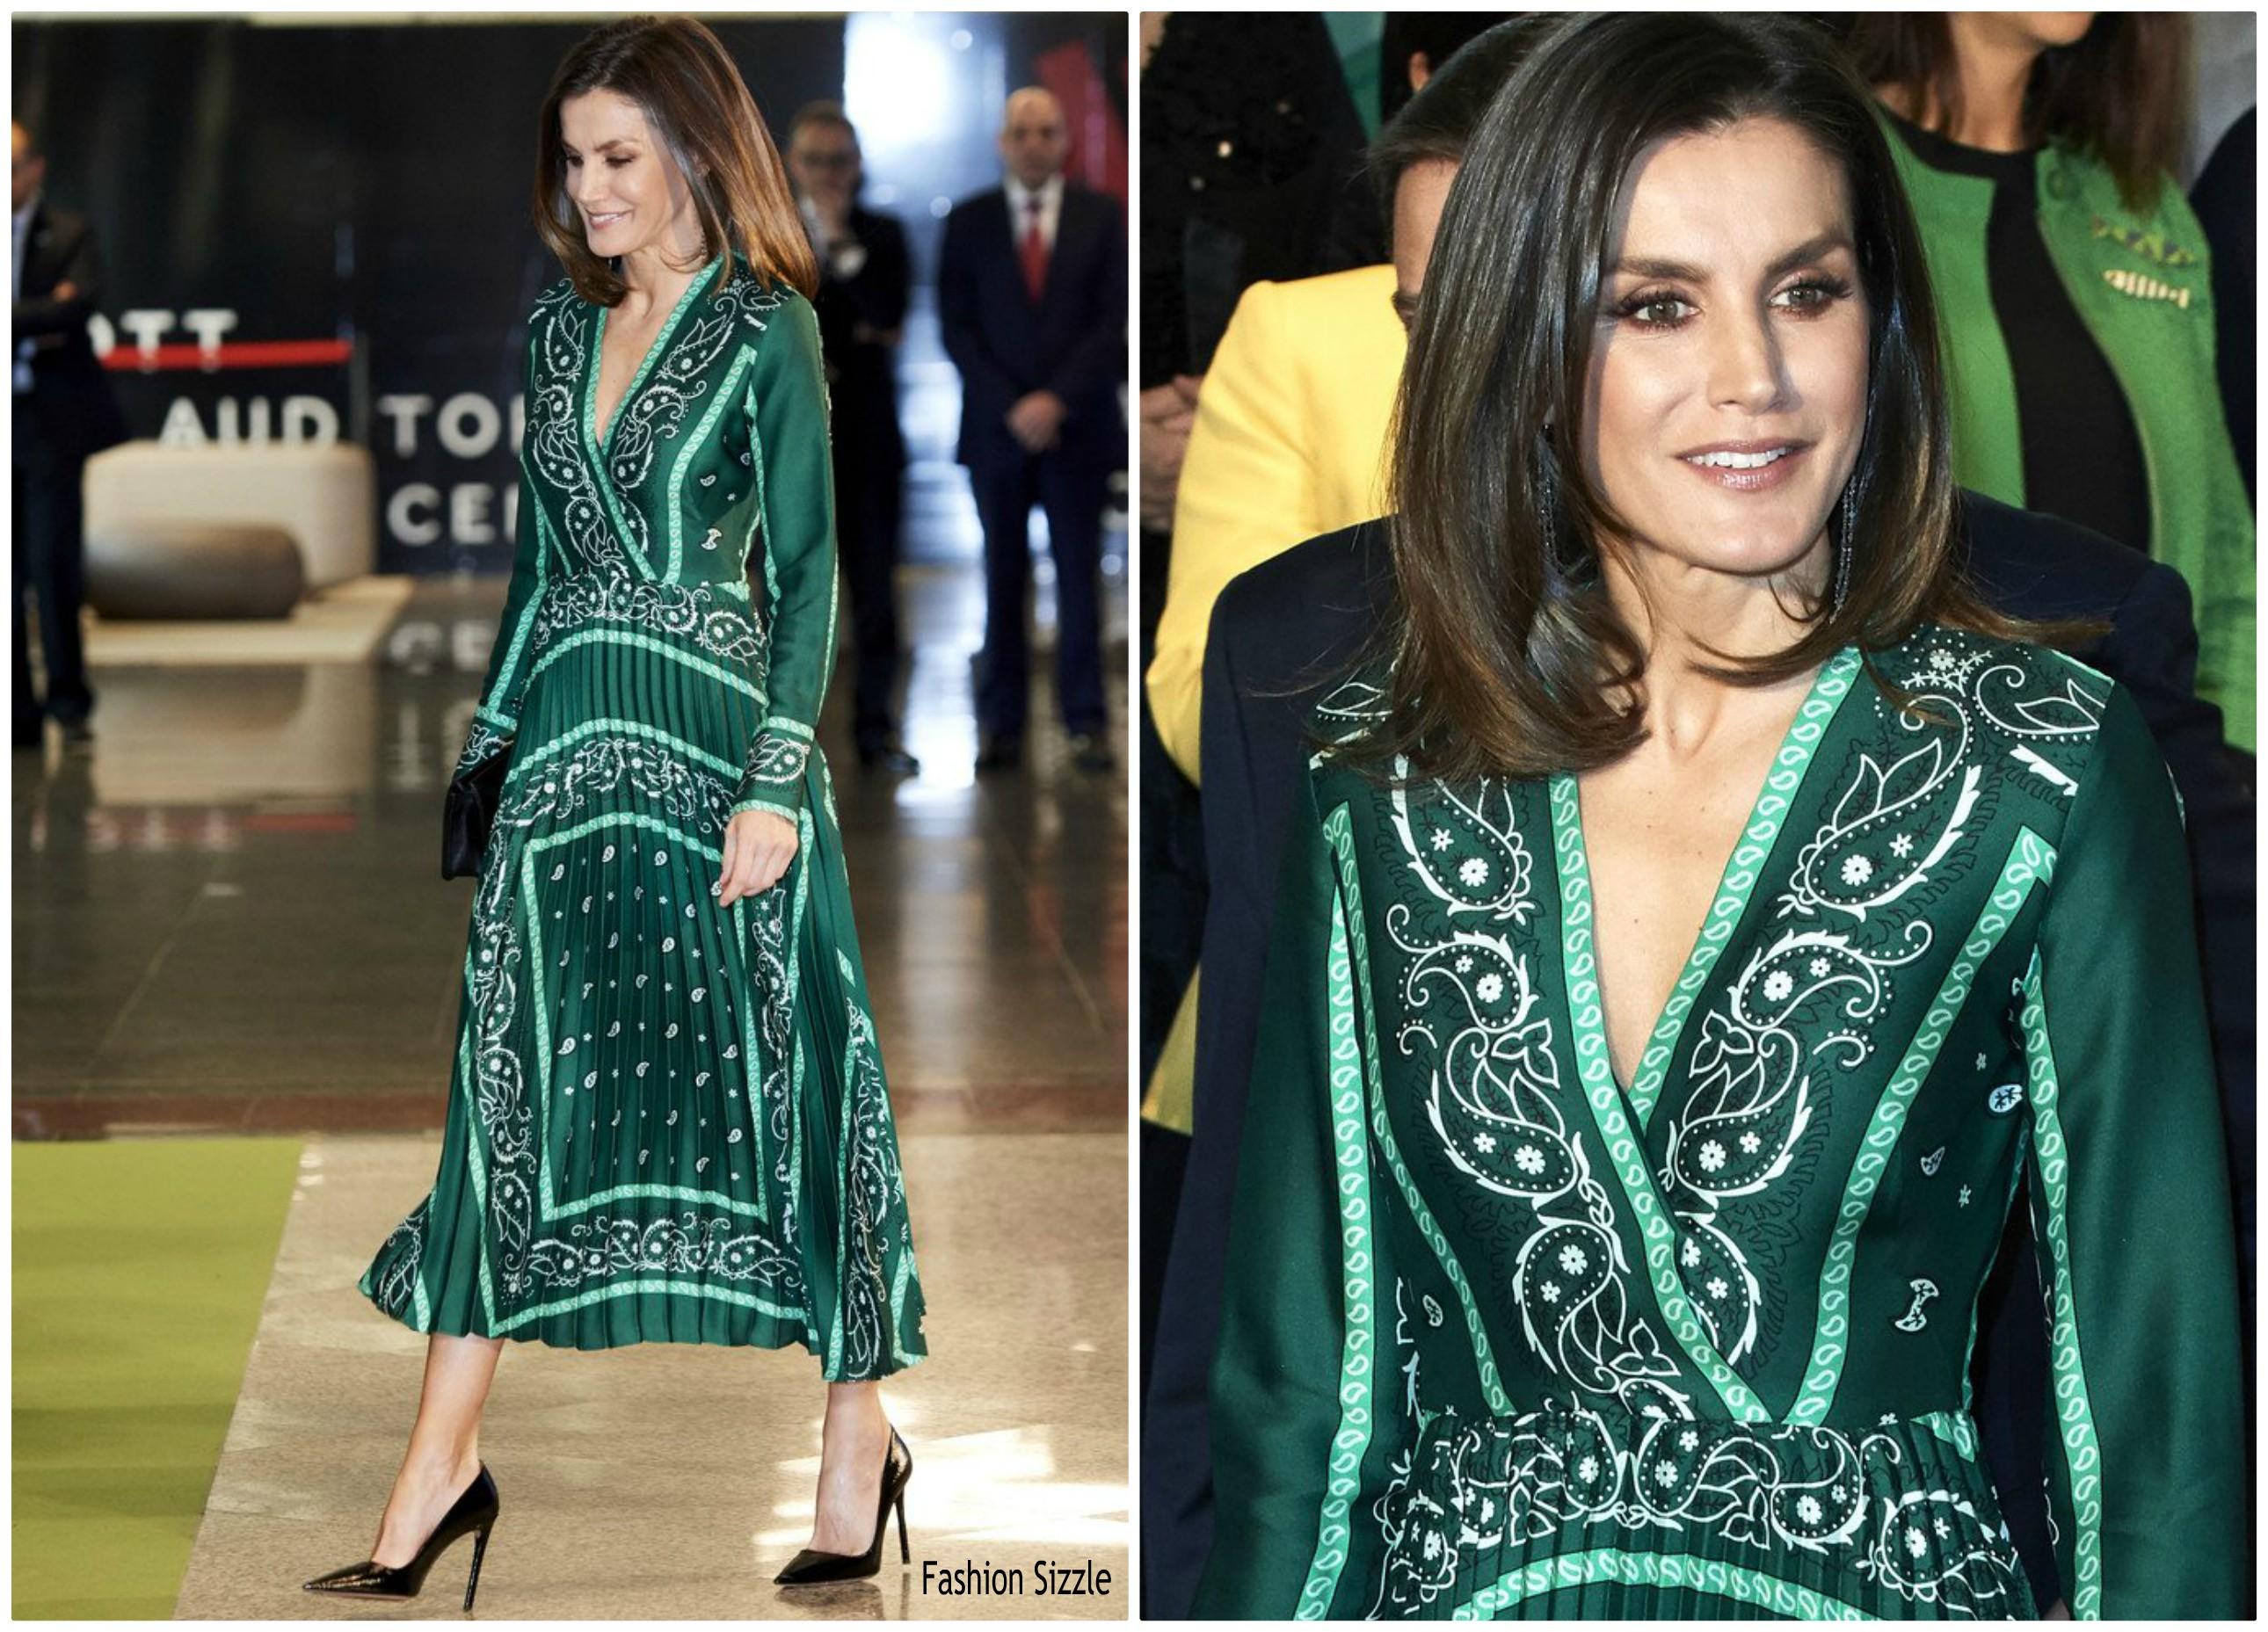 queen-letizia-of-spain-in-sandro-the-closue-of-afammer-international-congress